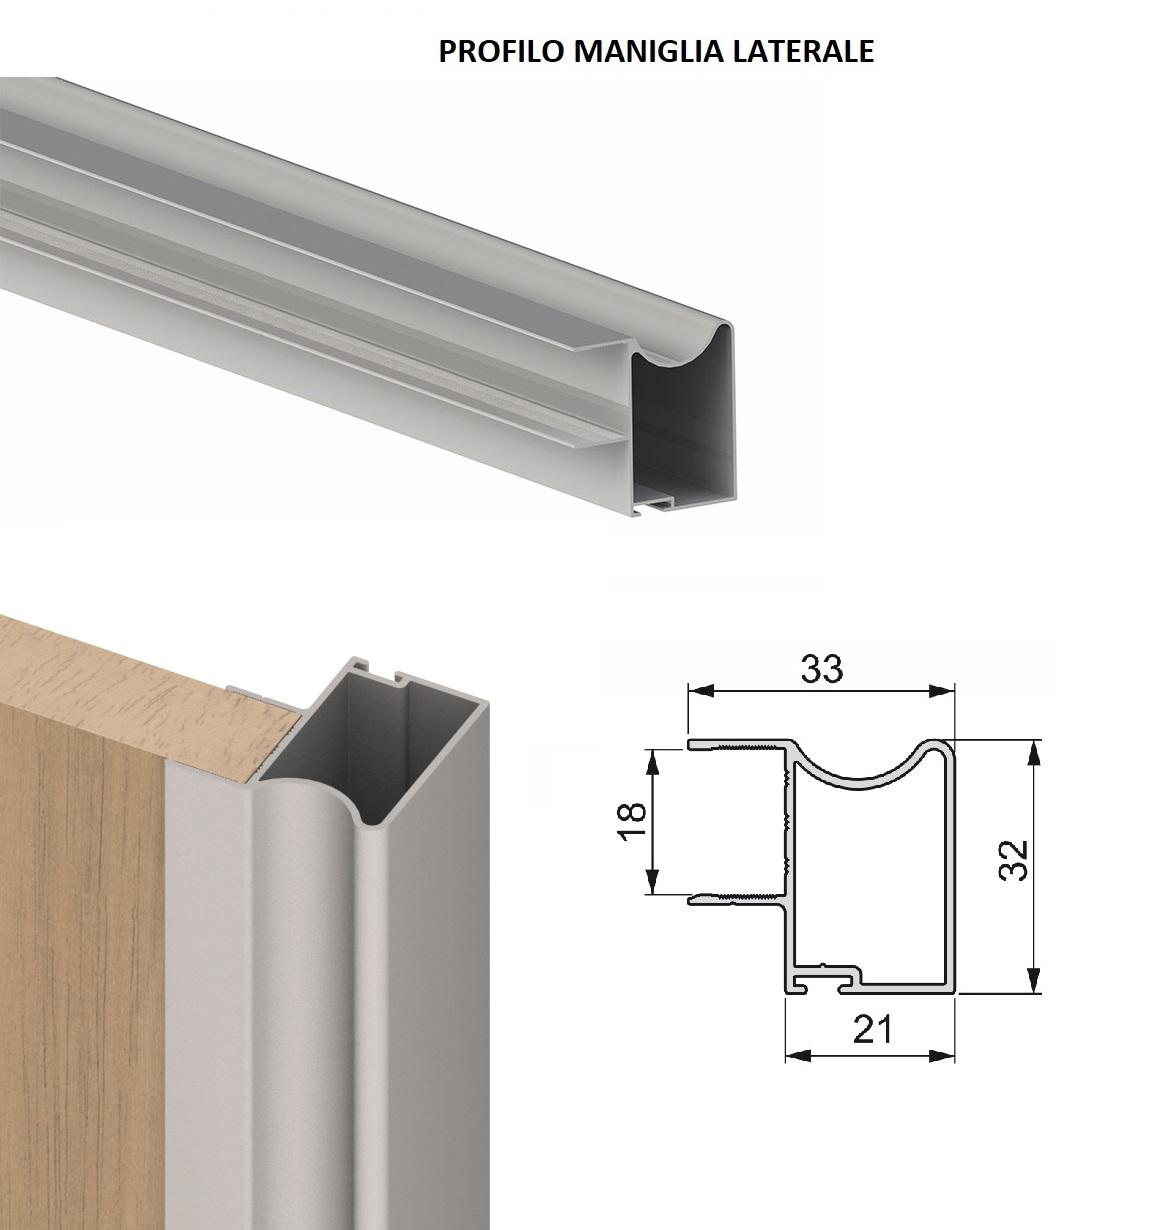 Kit Ante Scorrevoli Per Armadi A Muro.Profilo Maniglia Per Kit Armadio Ante Scorrevoli 18 Mm Placard Emuca